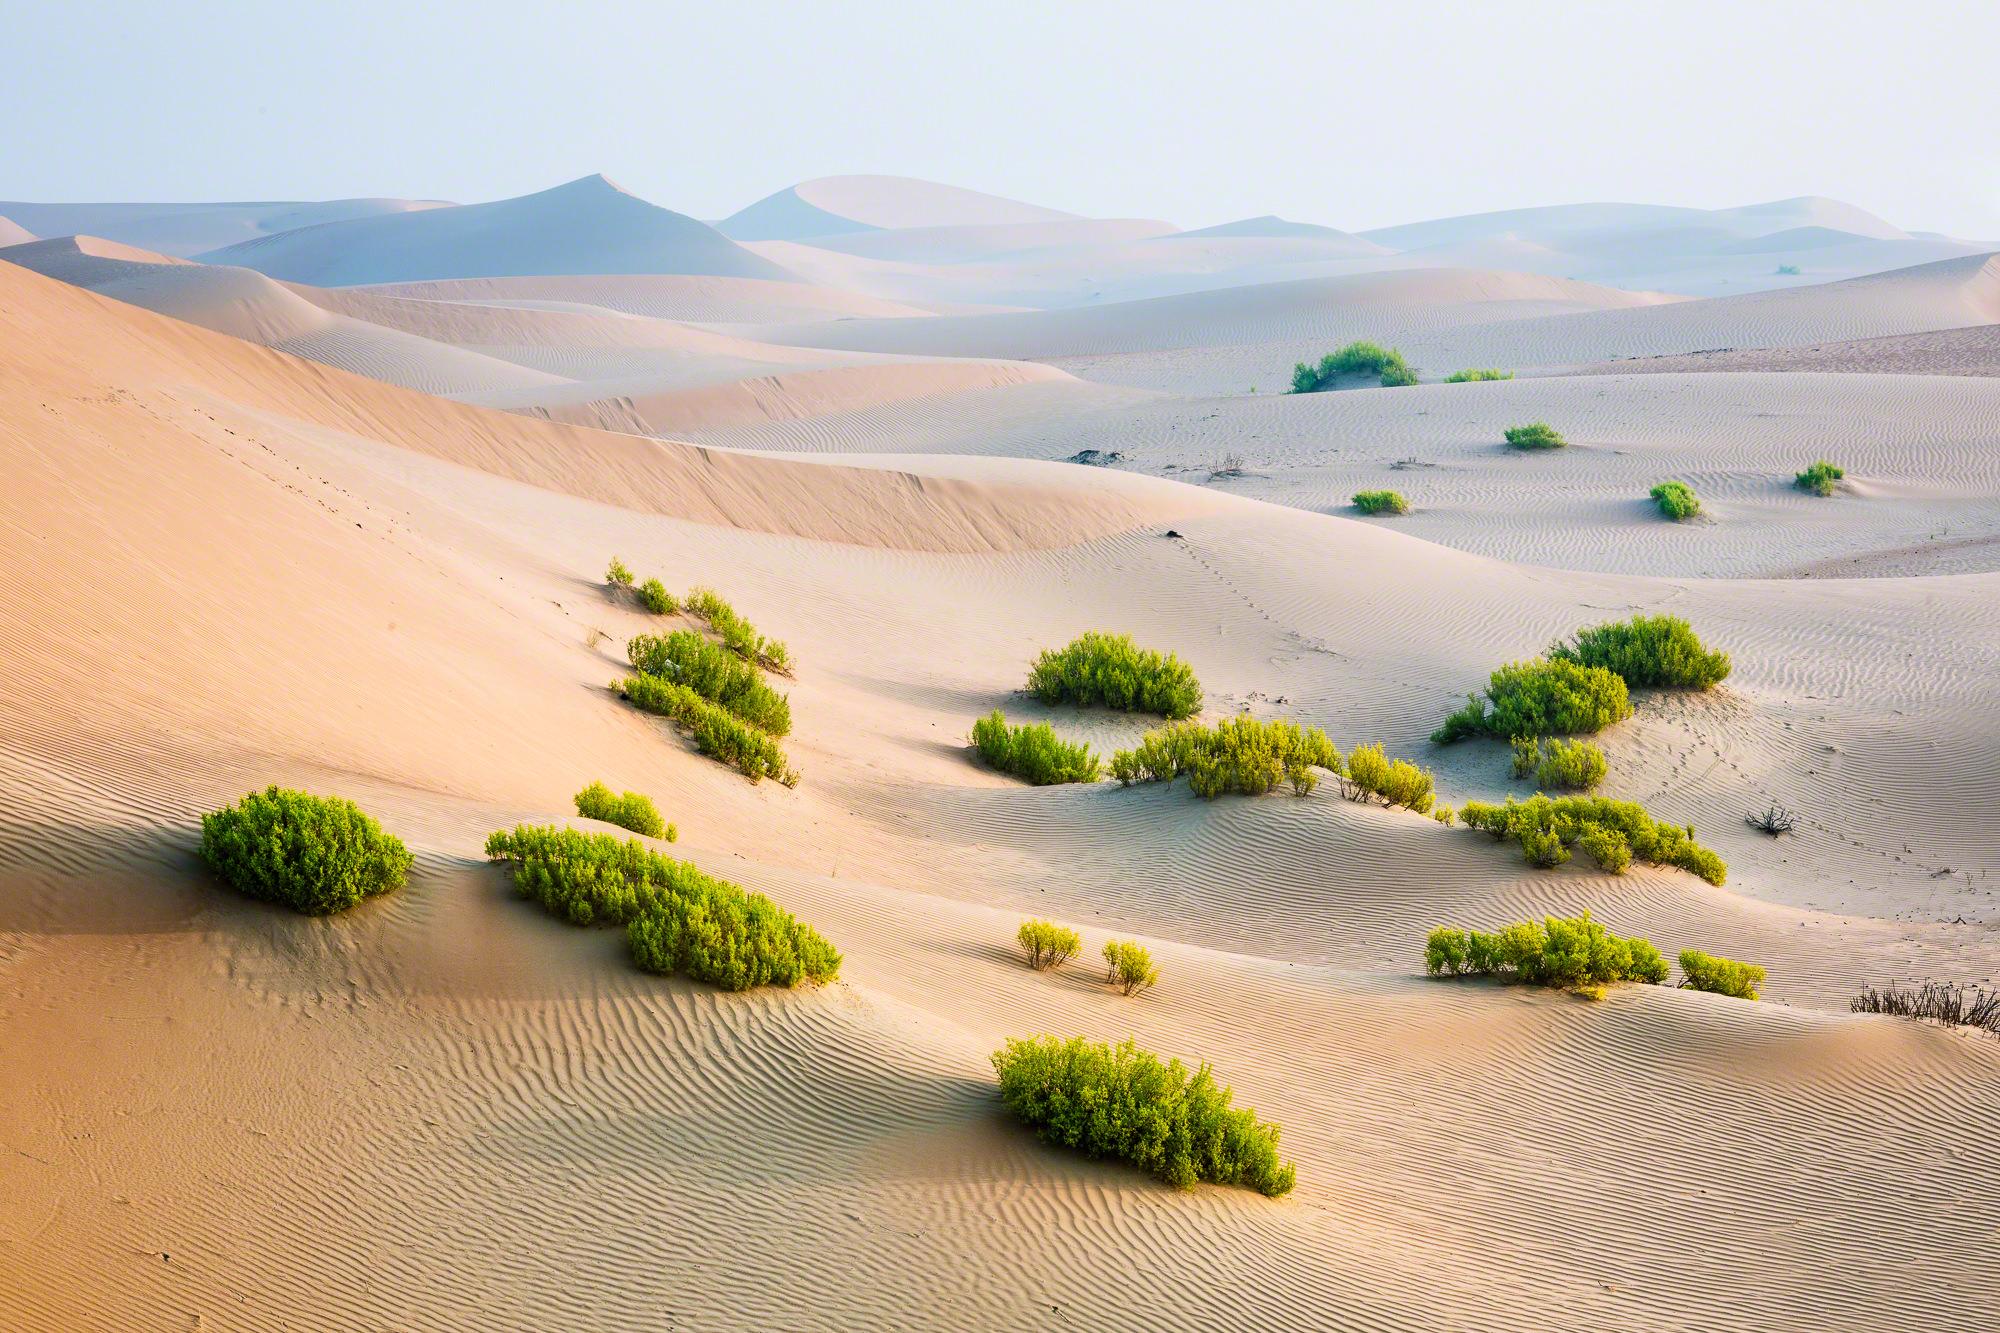 The Abu Dhabi Desert Nicolesy